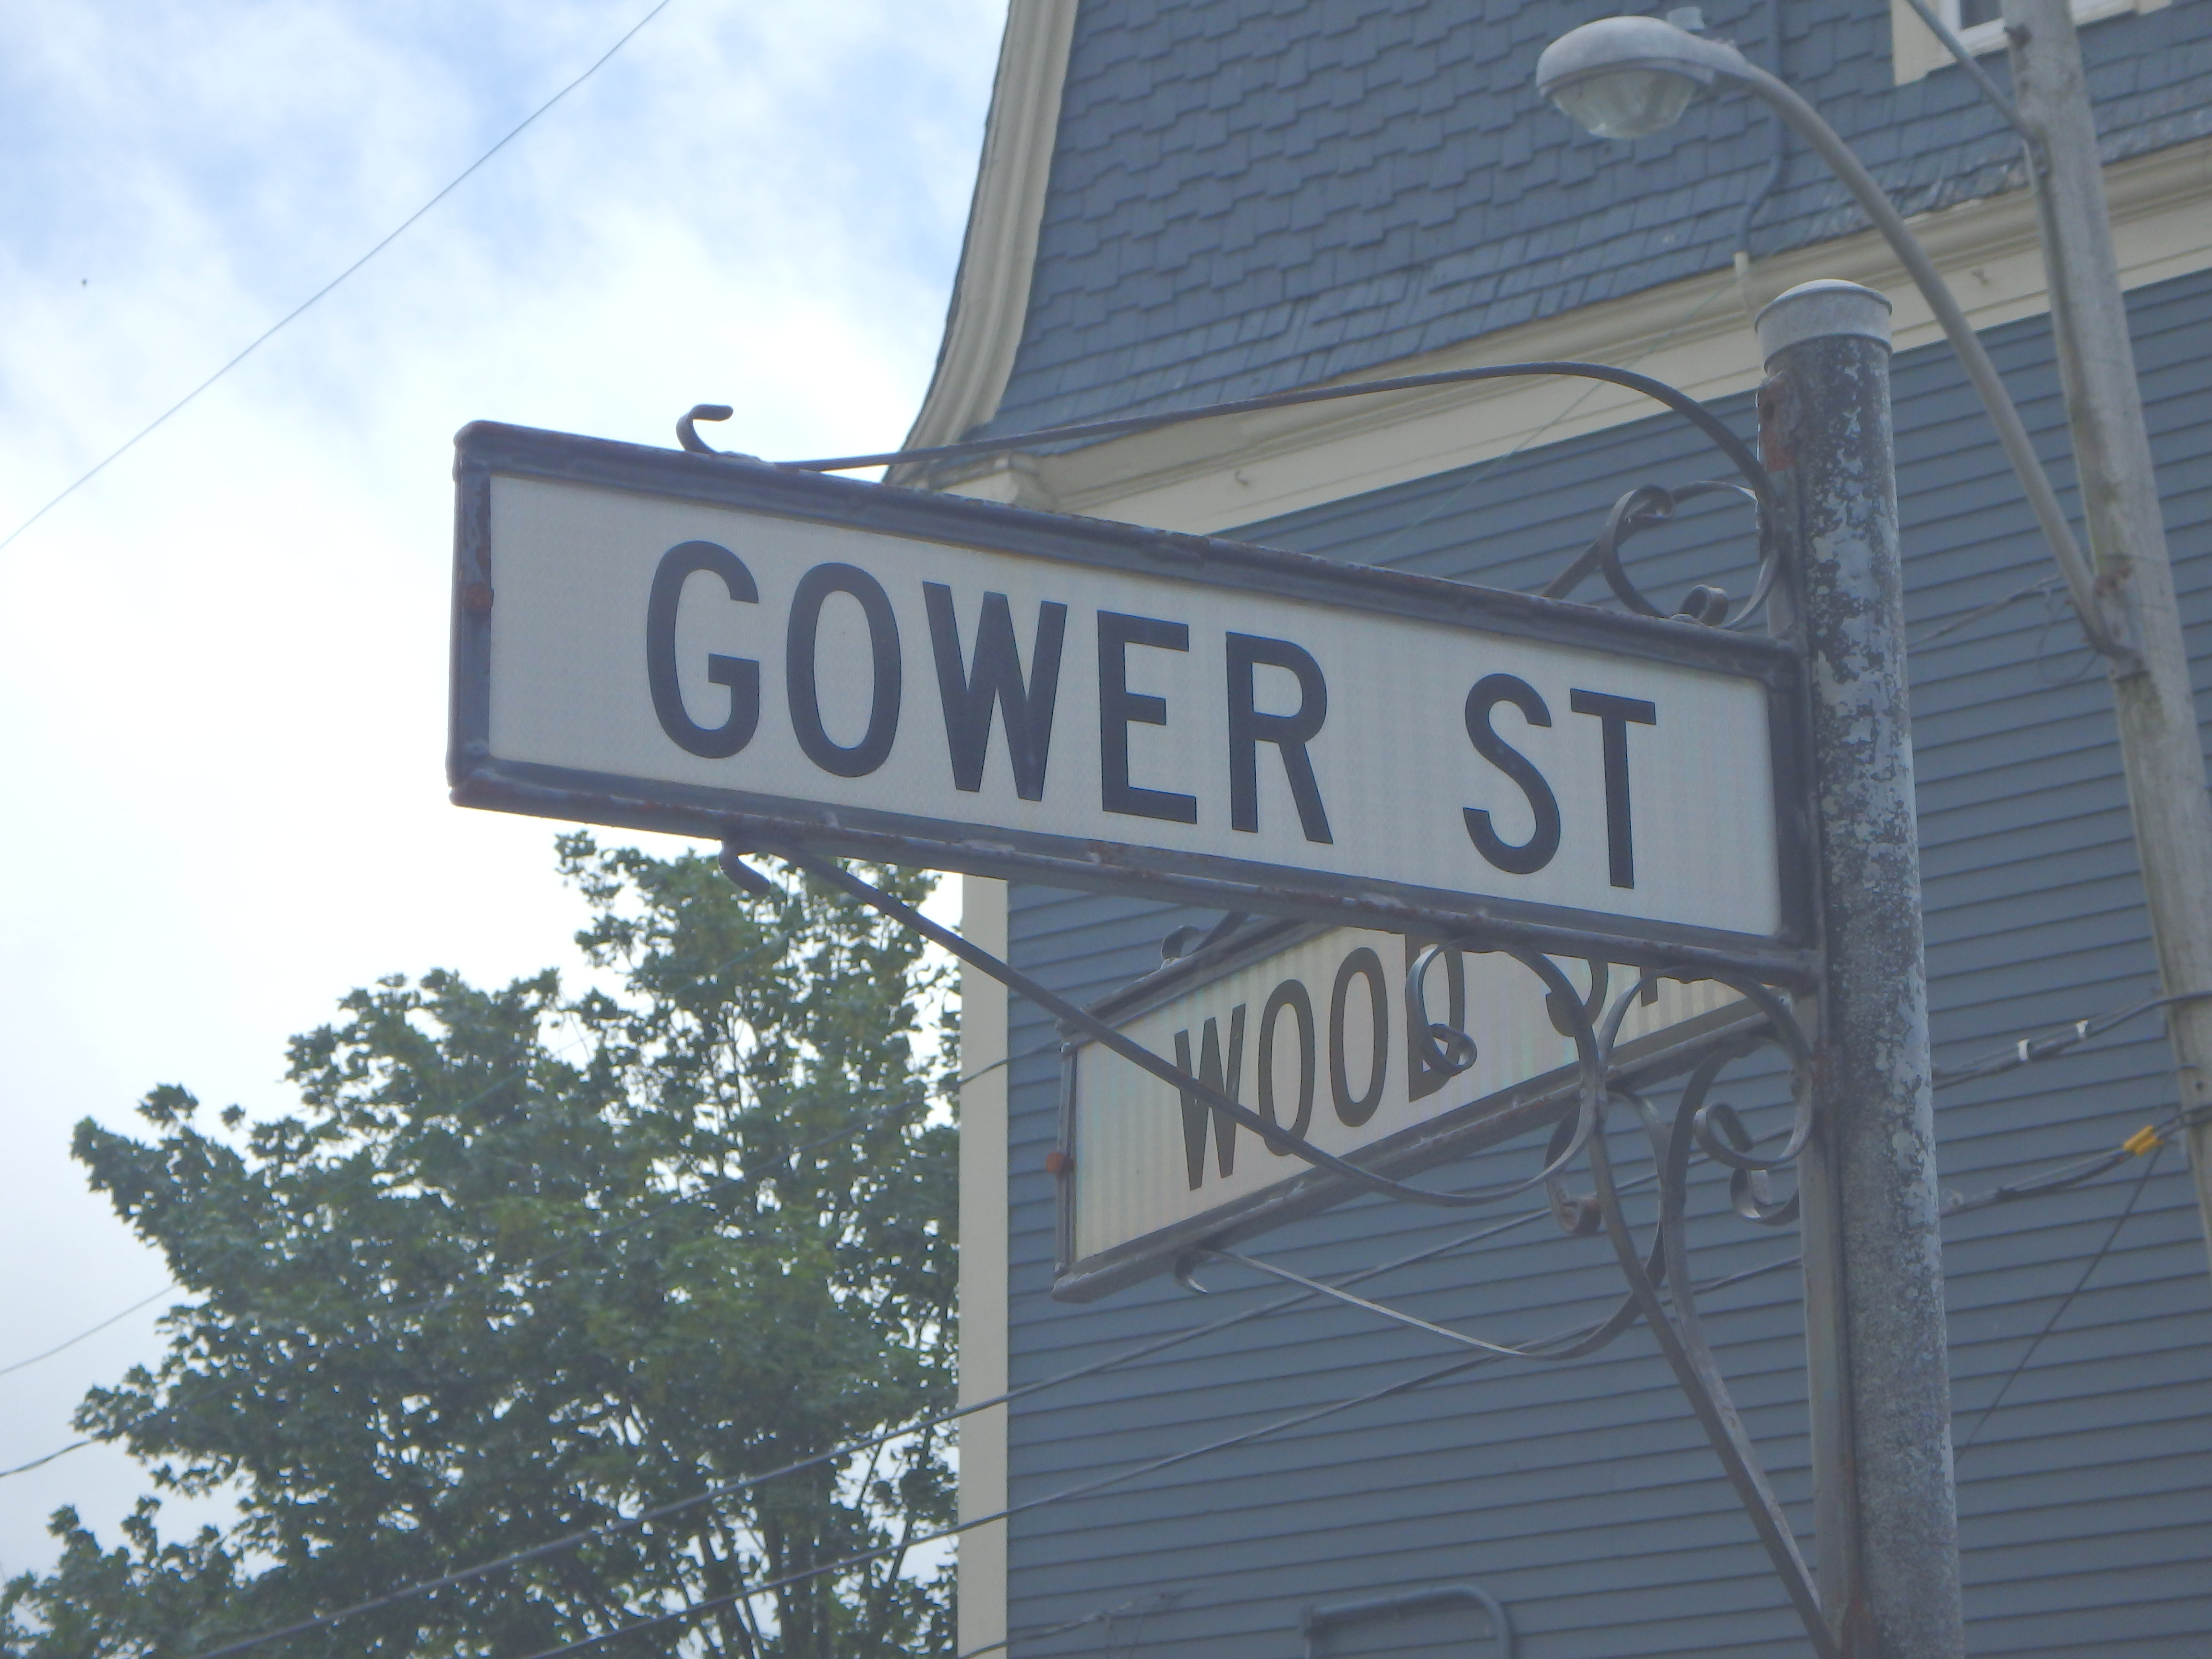 Gower Street; Saint John's, Newfoundland; 2015